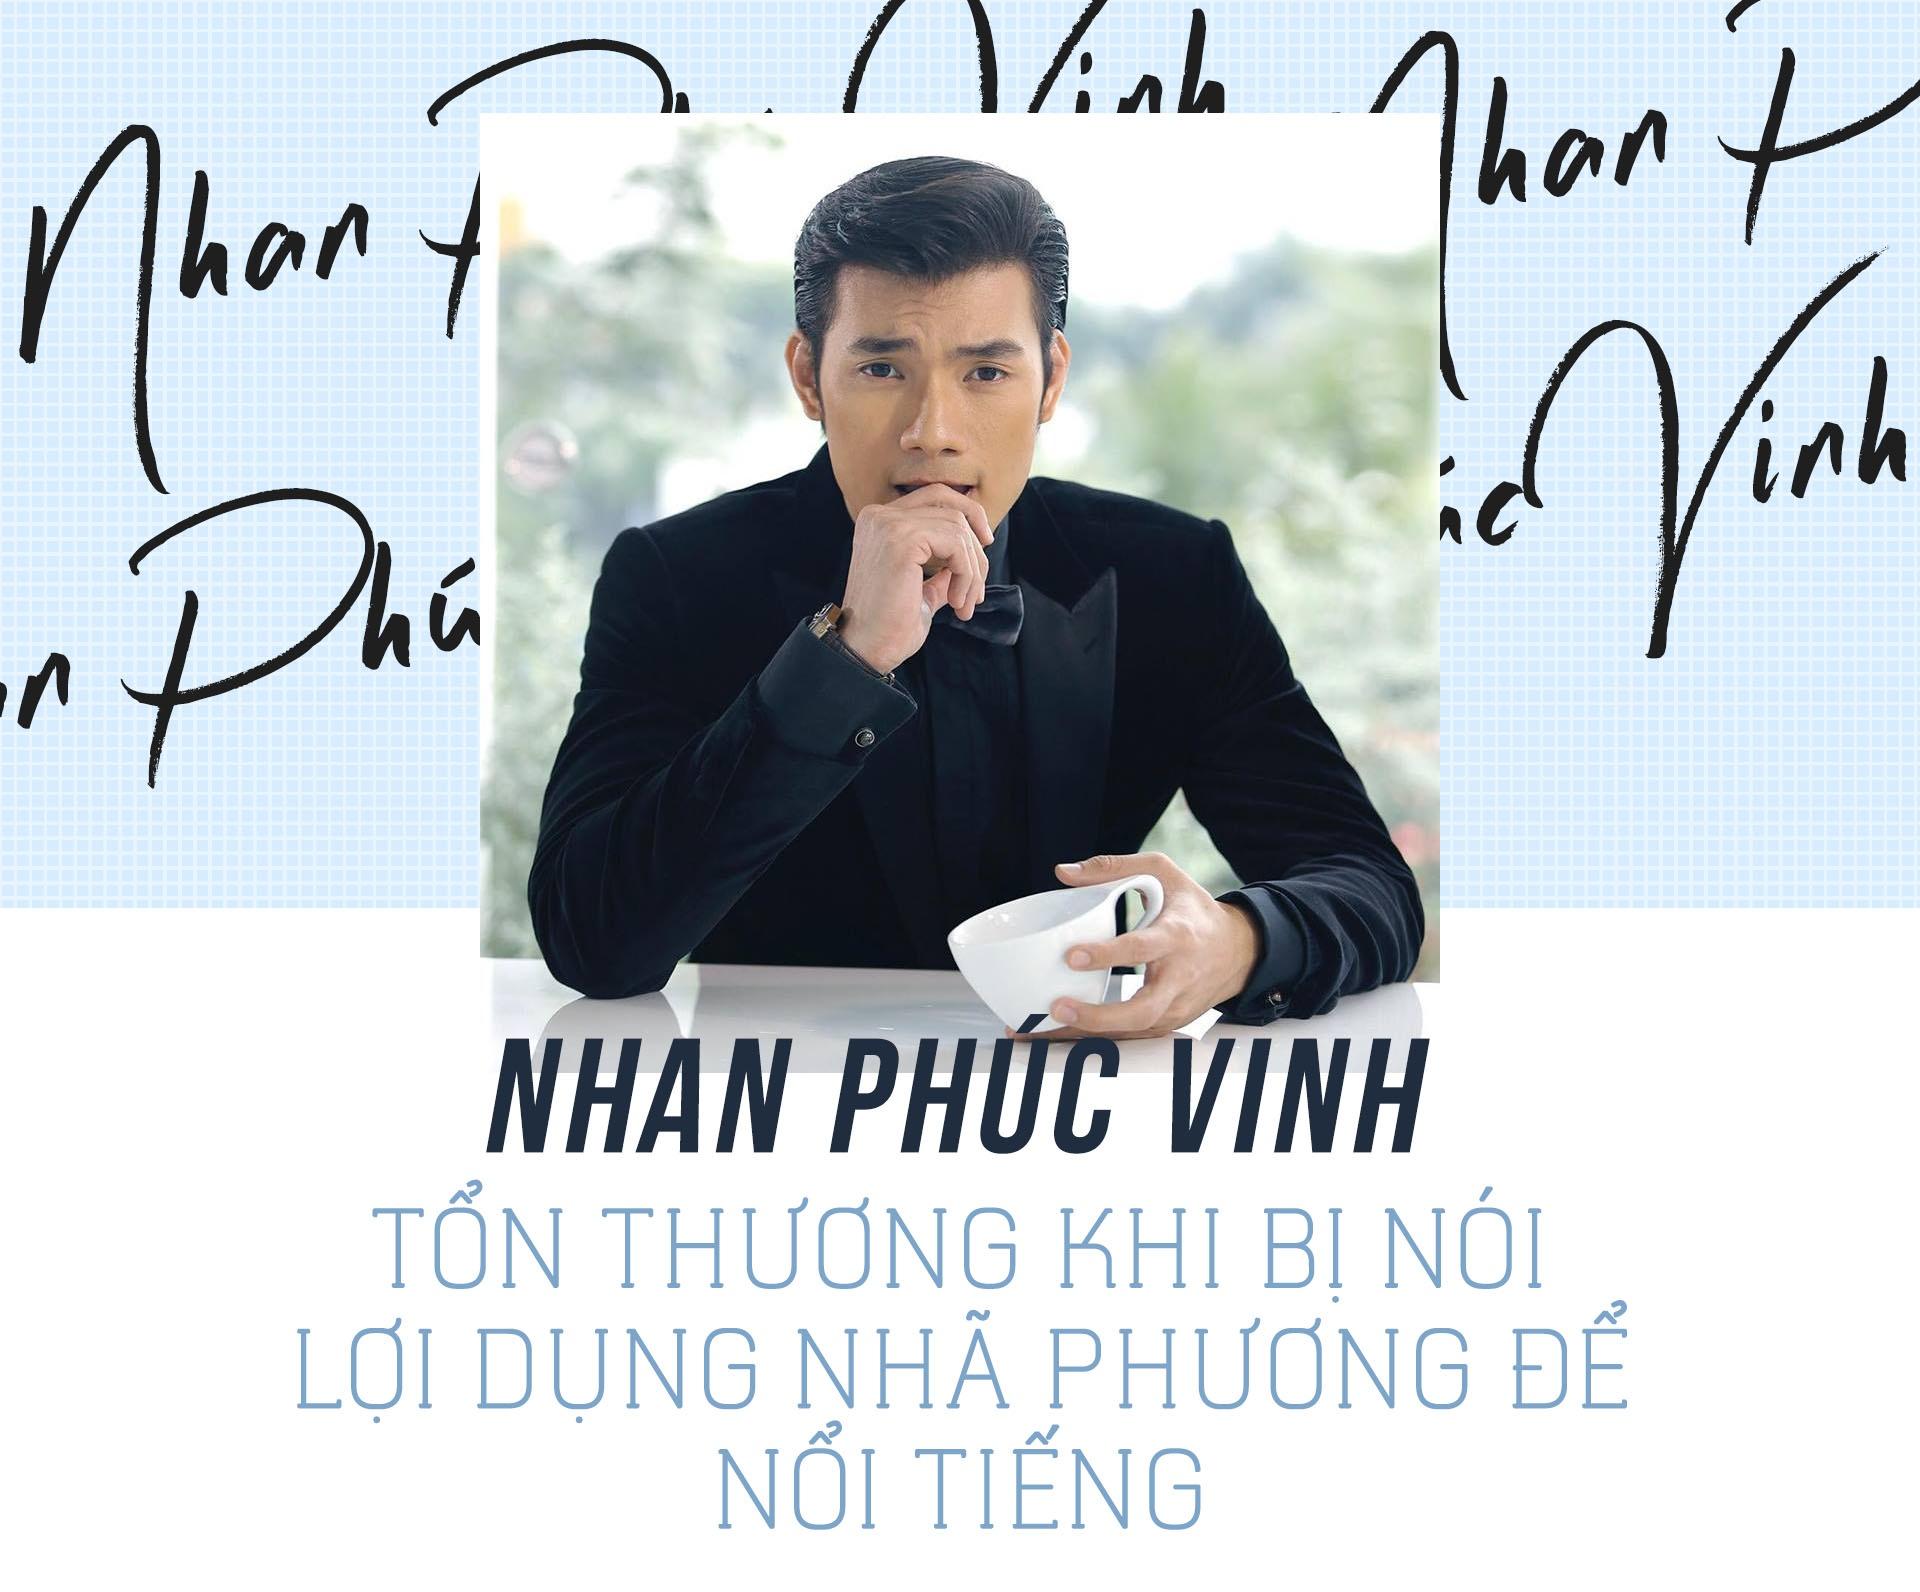 Nhan Phuc Vinh Nha Phuong anh 2